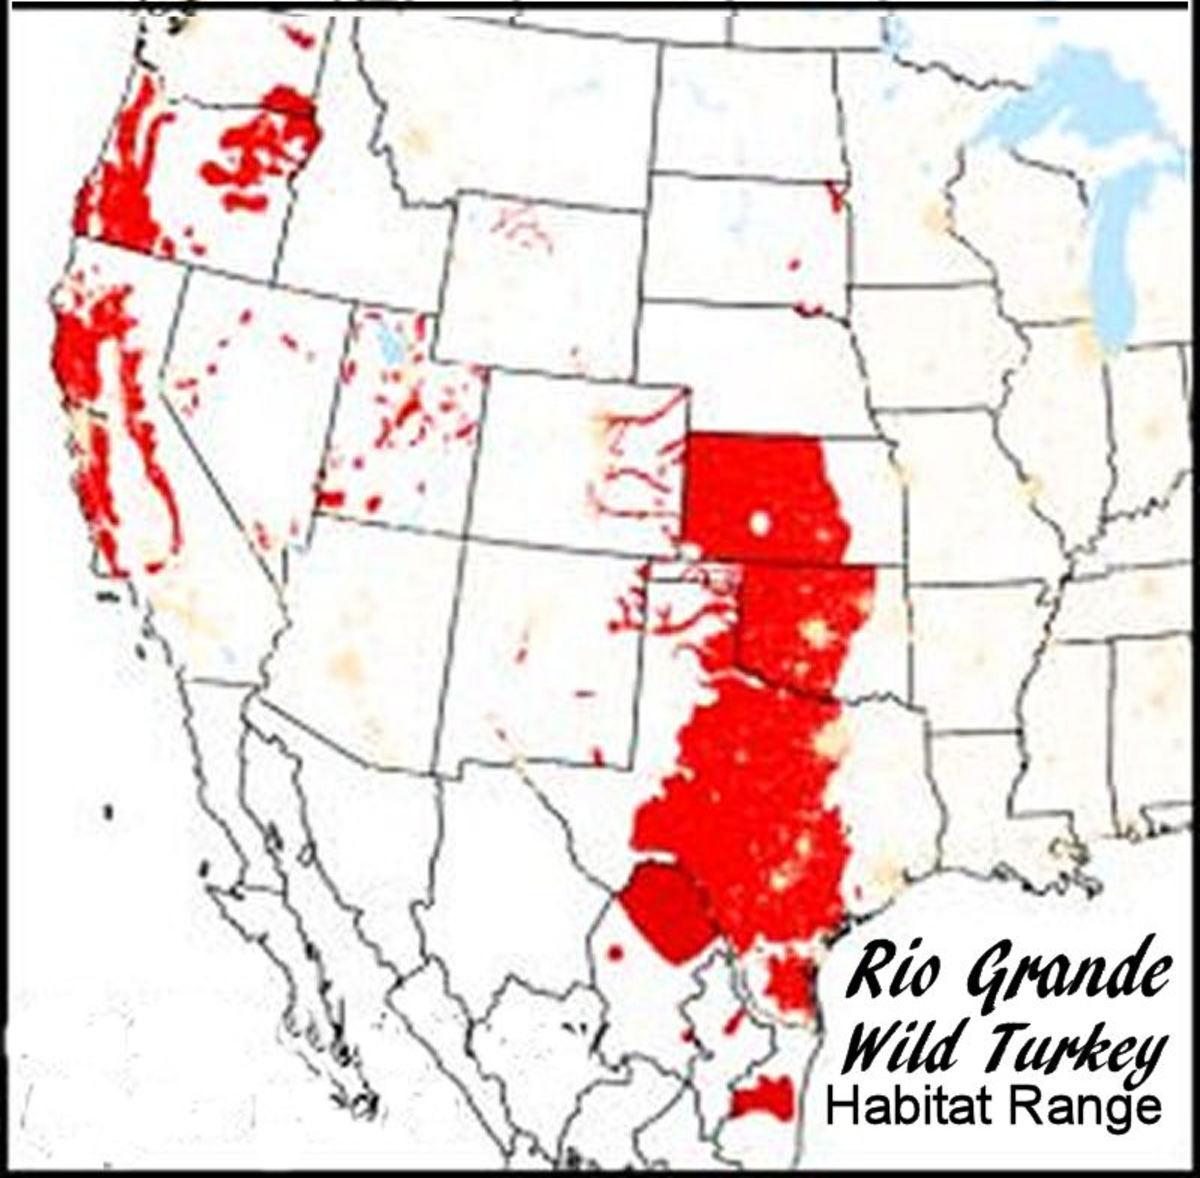 Rio Grande wild turkey habitat region